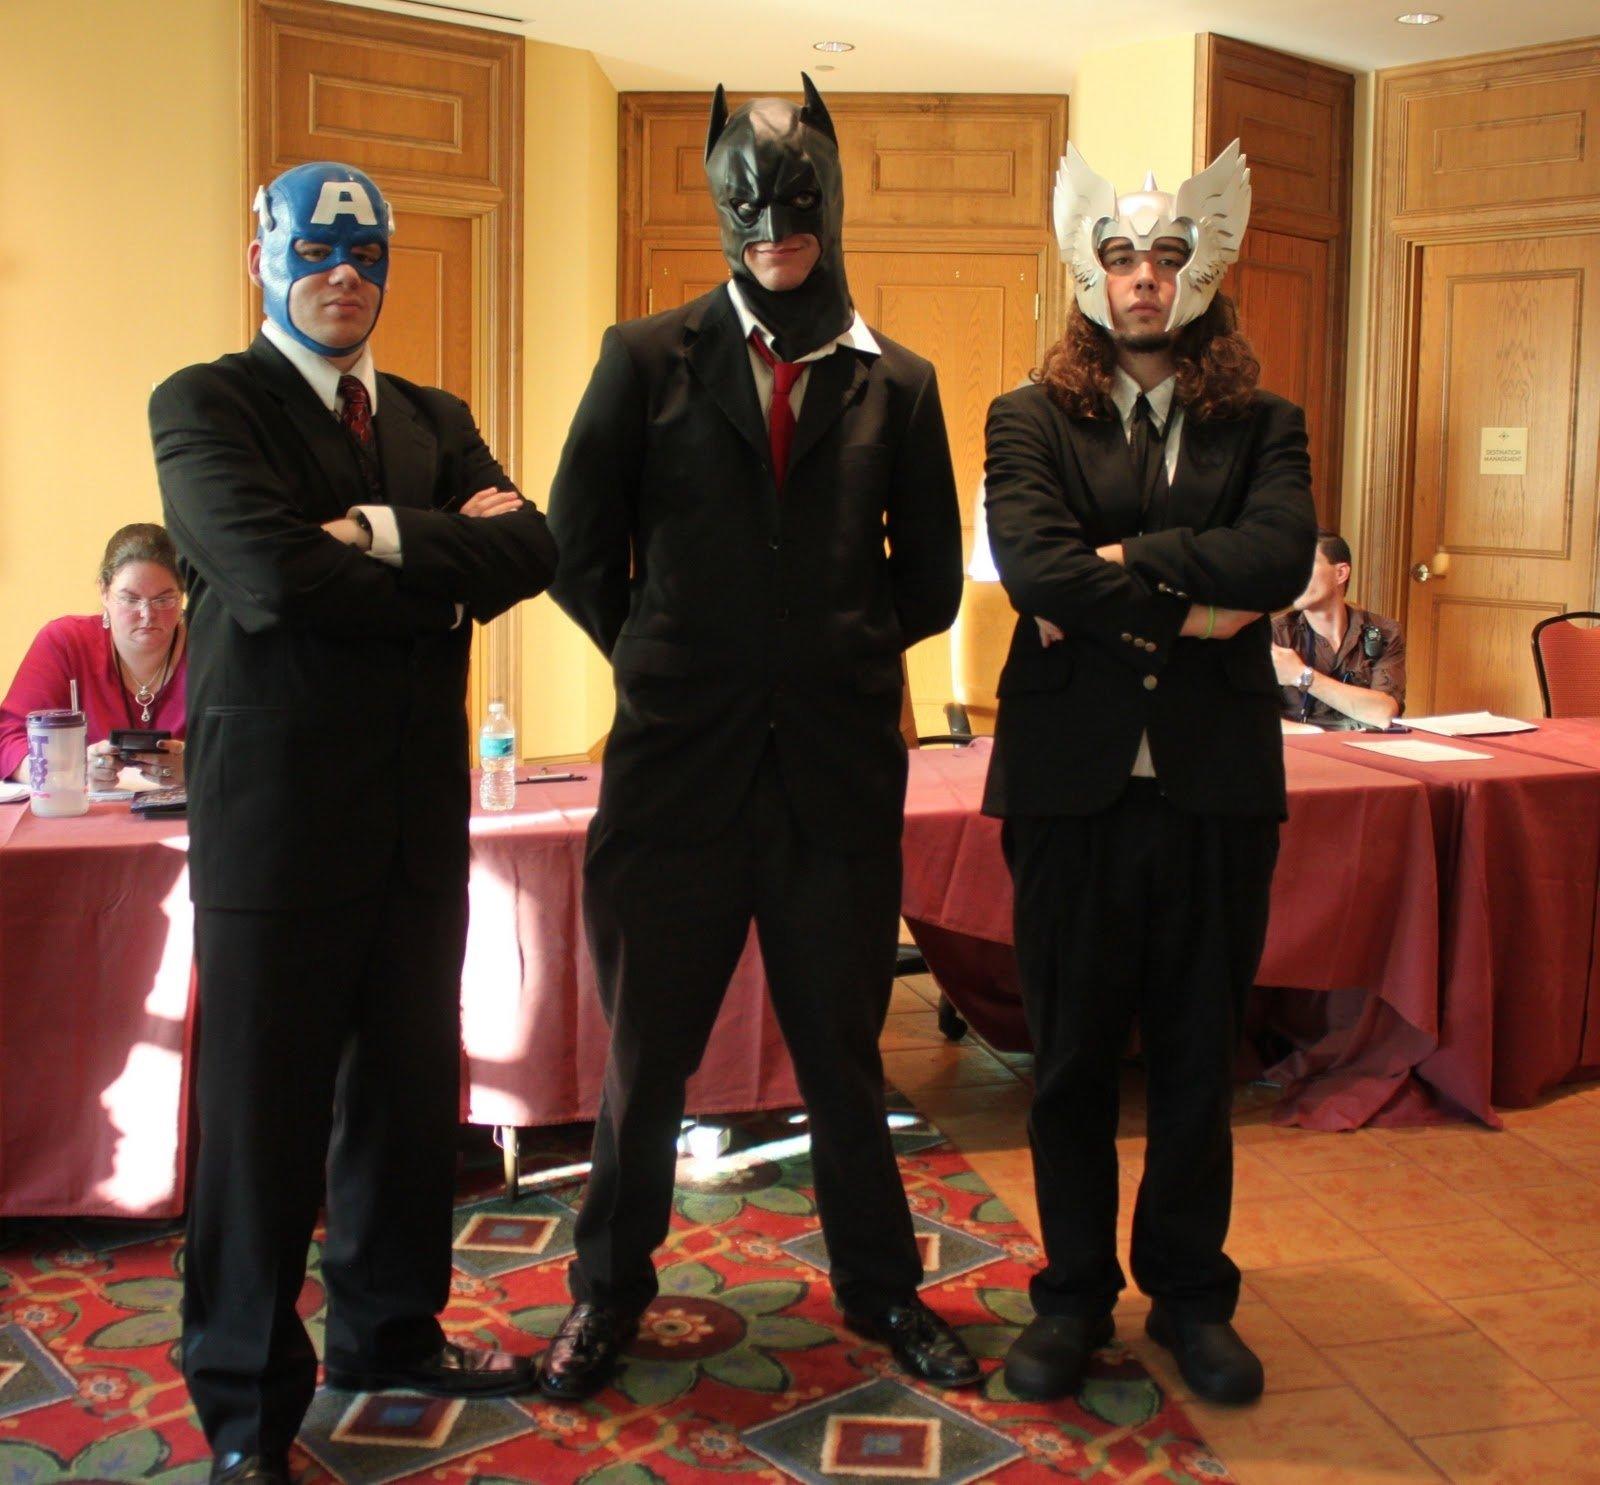 10 Lovely Thrift Store Halloween Costume Ideas thrift store halloween costumes superheroes and alter egos 2020